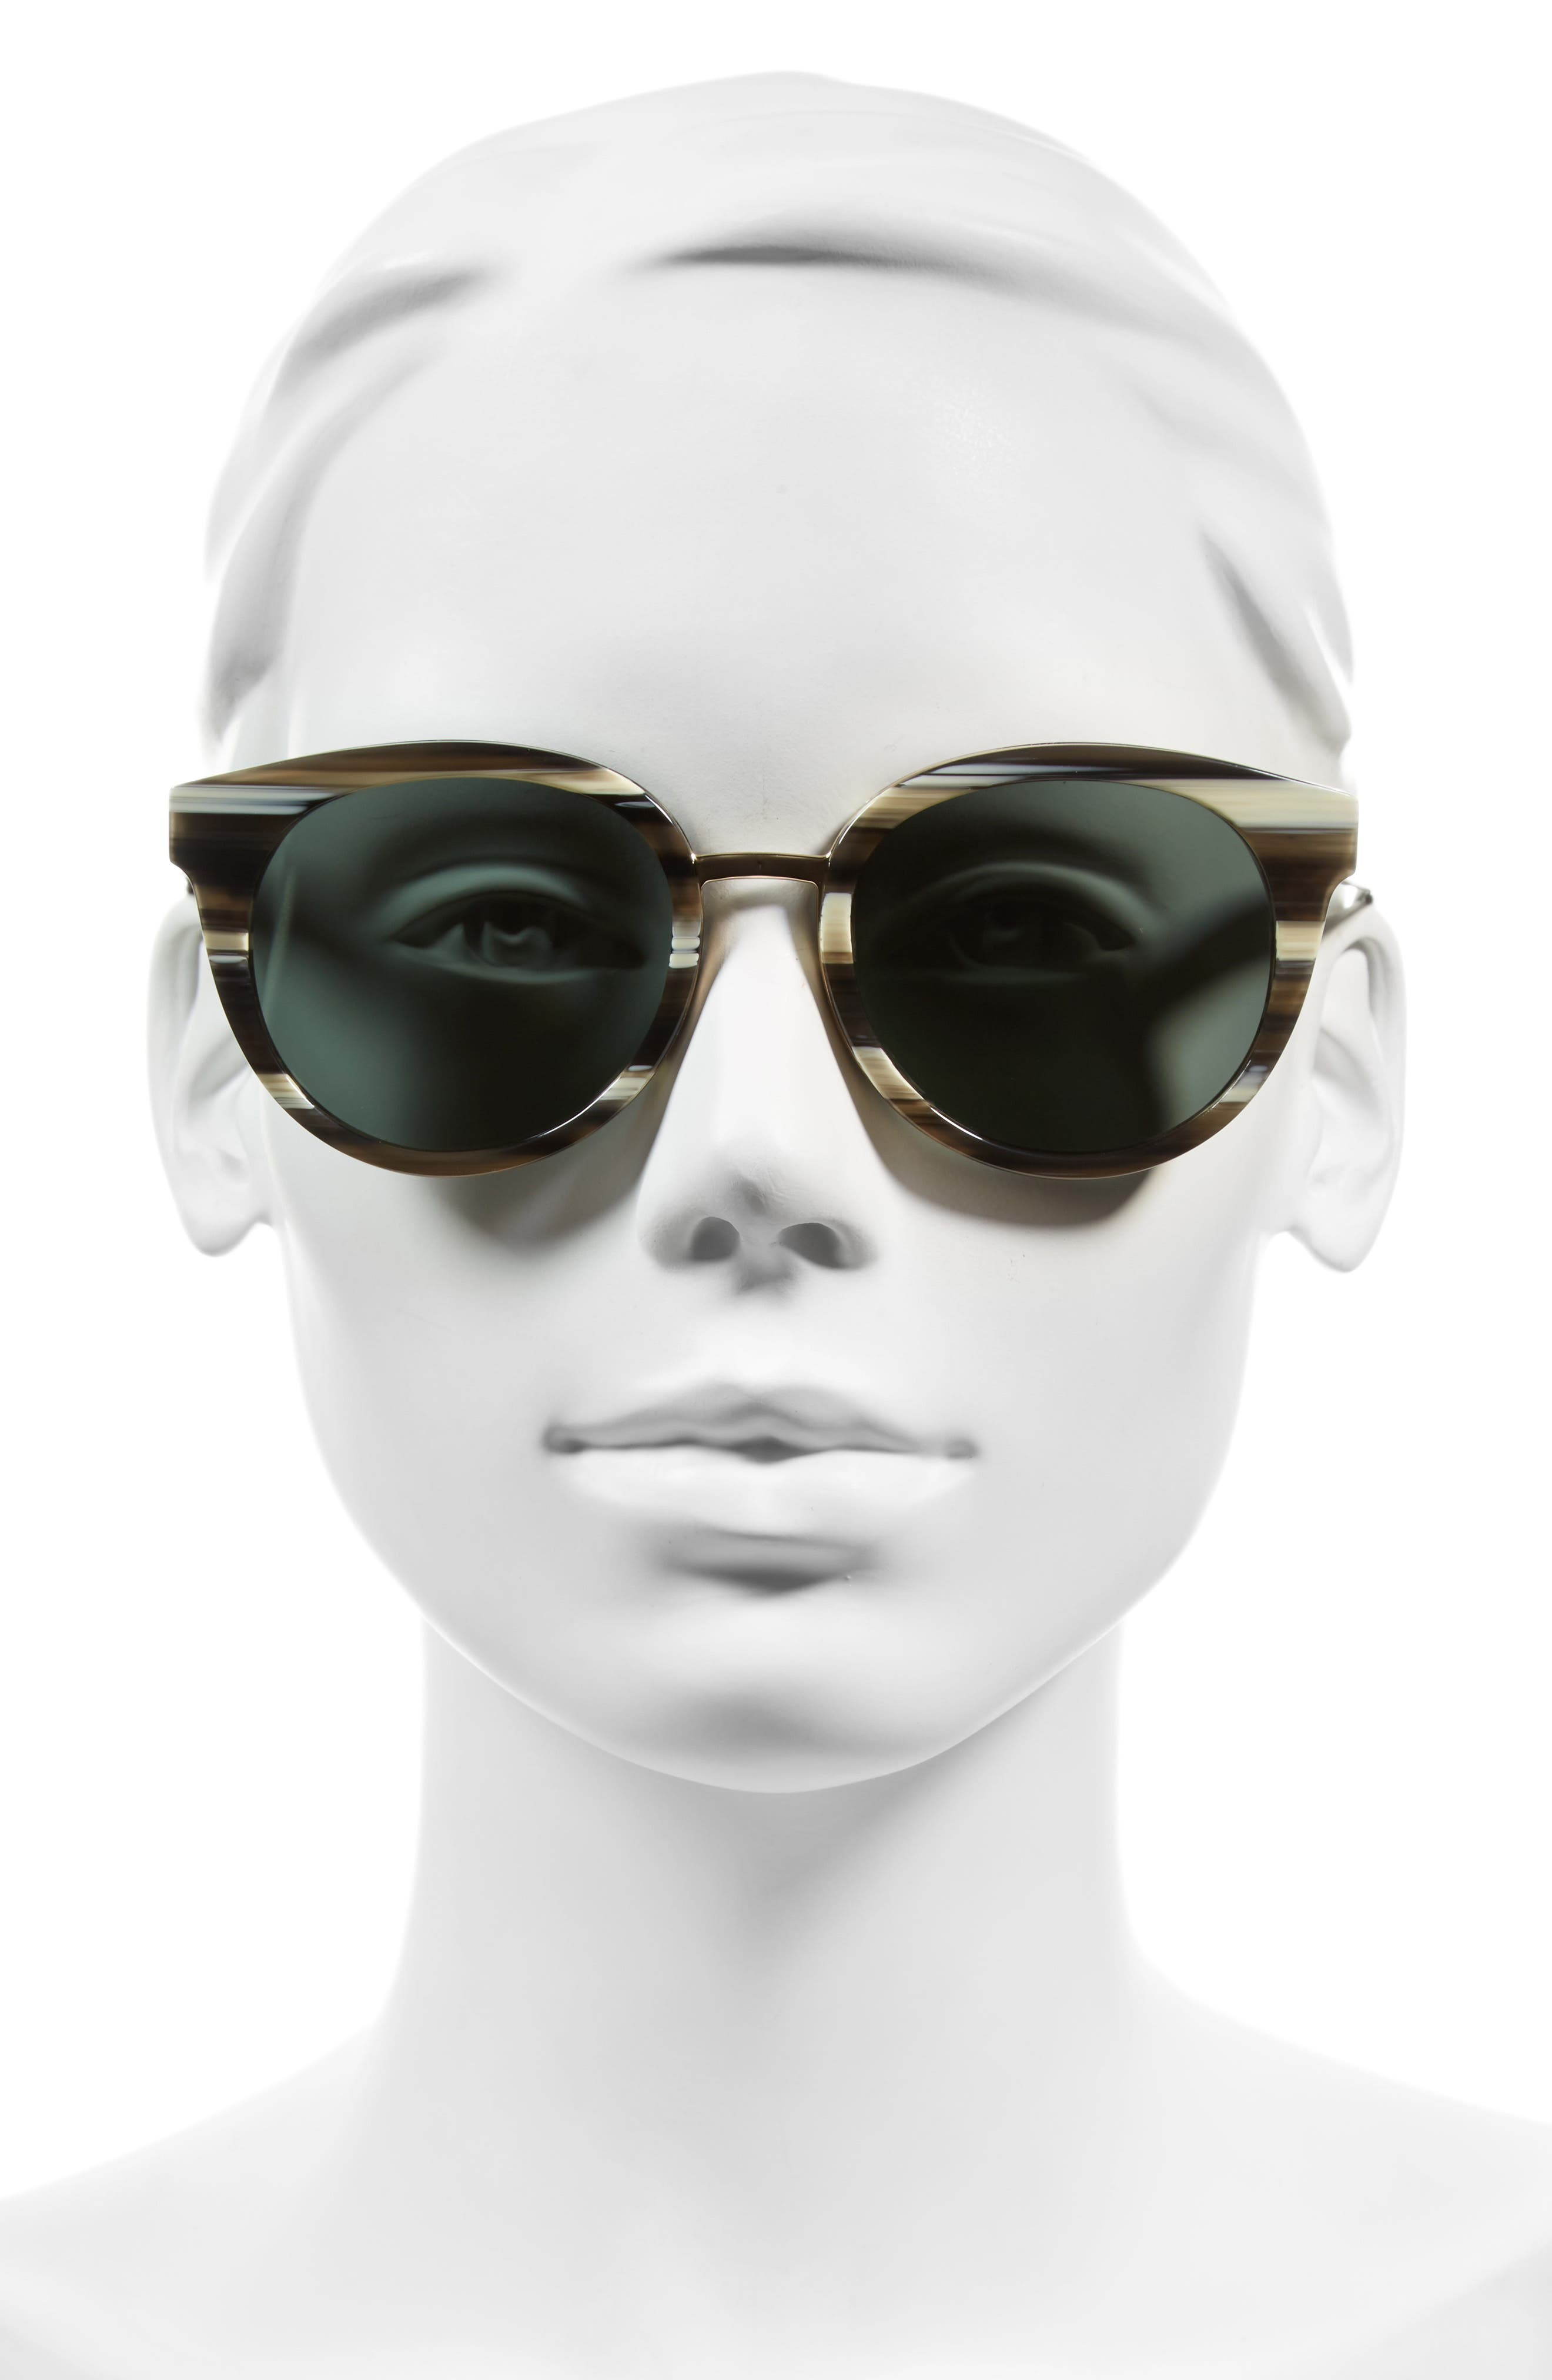 53mm Sunglasses,                             Alternate thumbnail 2, color,                             300